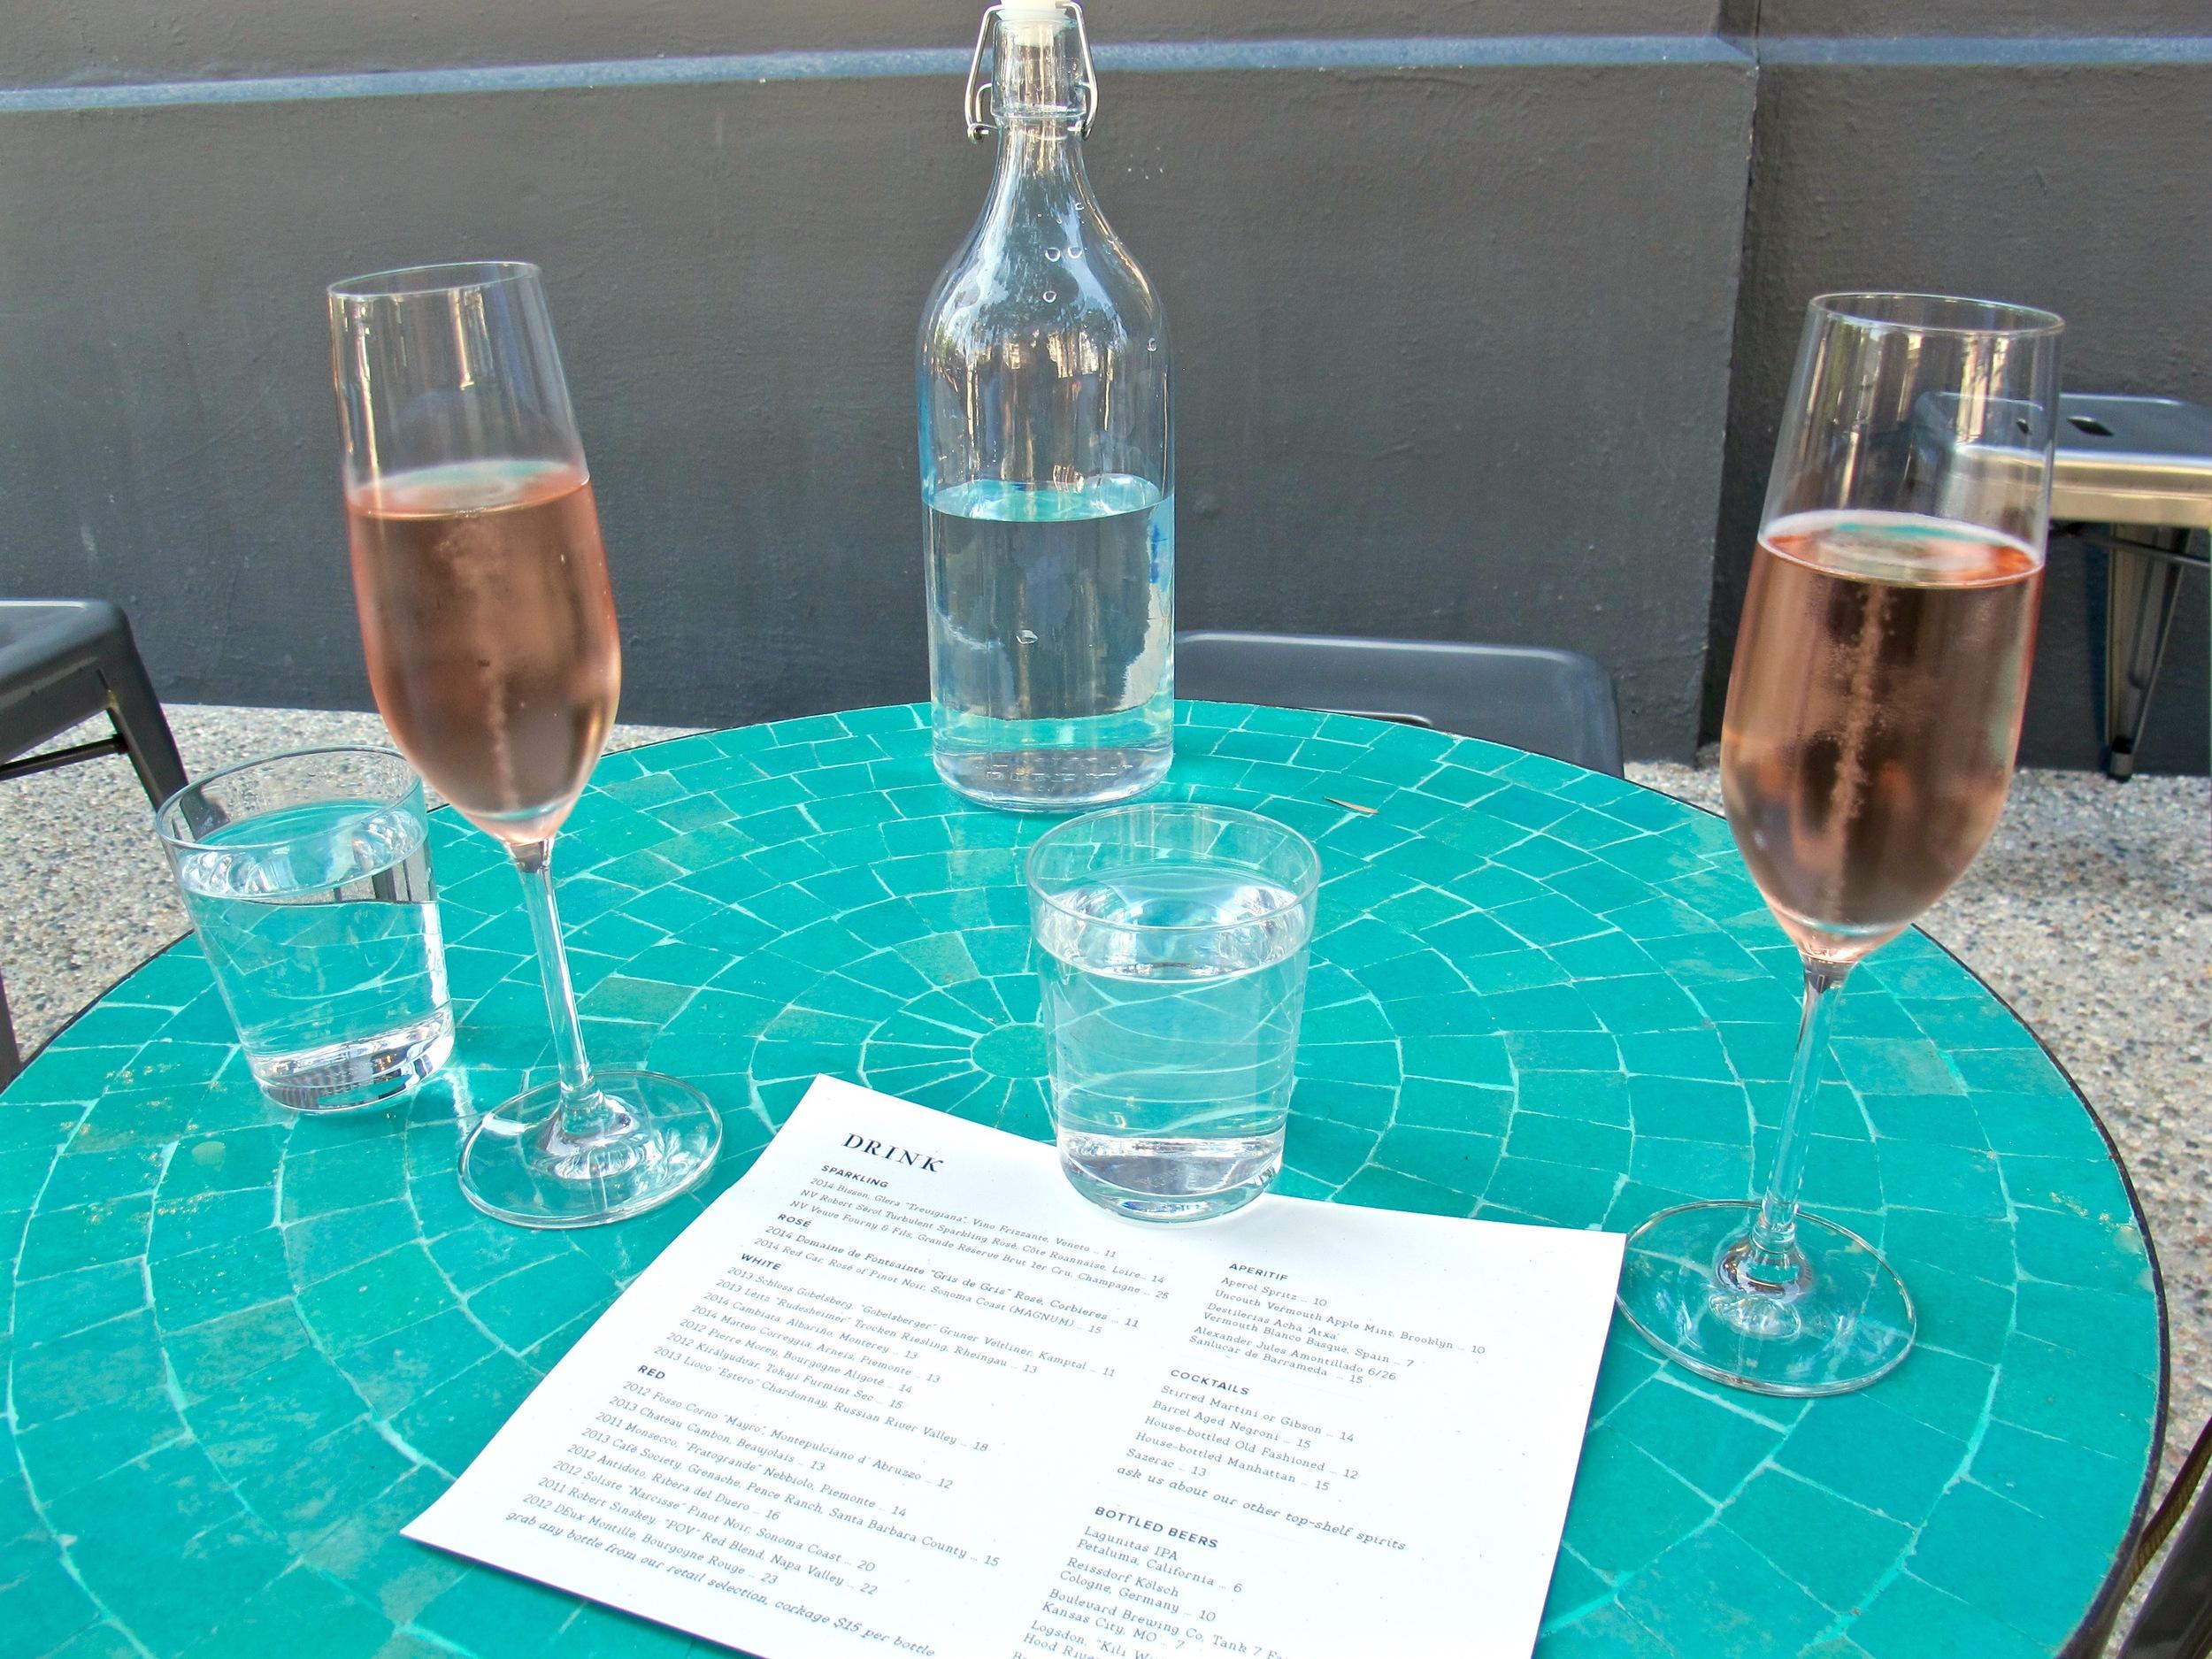 Esters sparkling wine